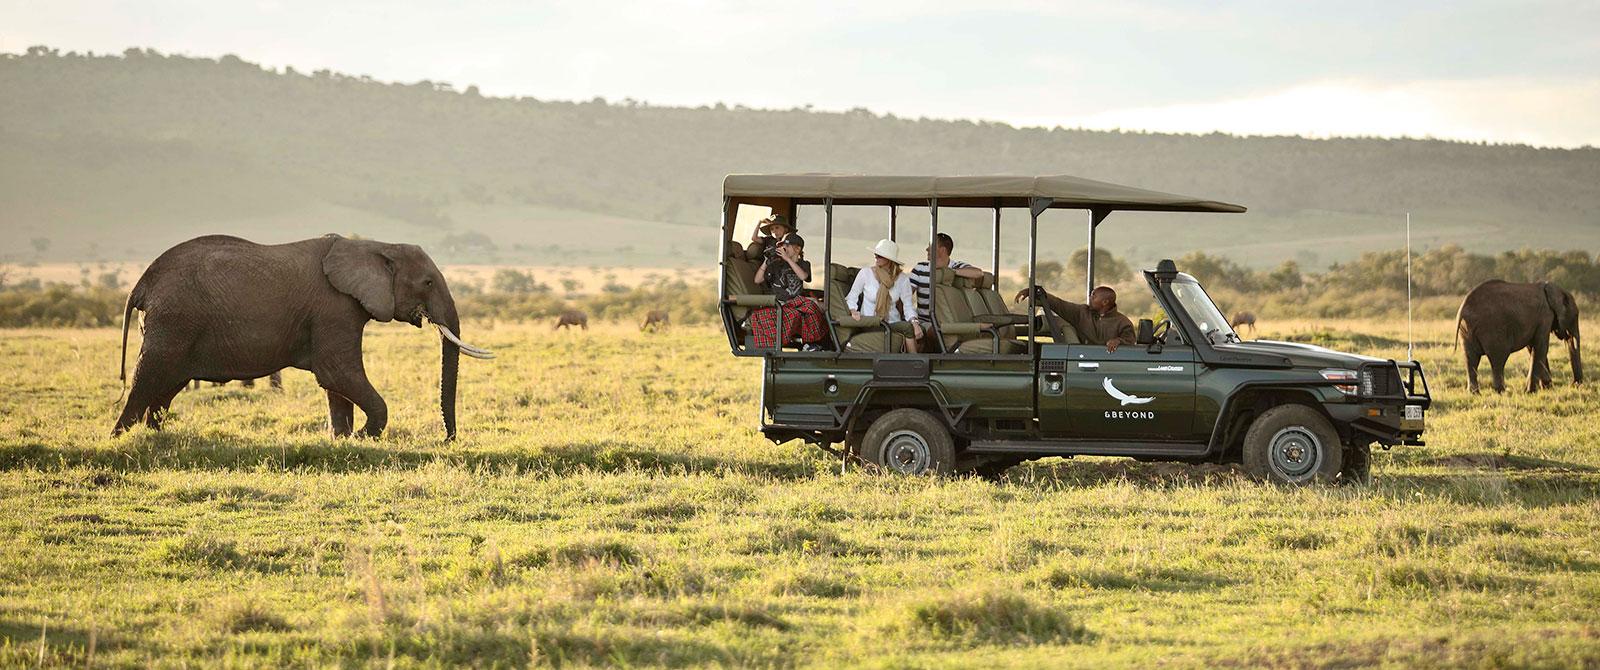 Elephant Seen on Safari in the Masai Mara Kenya